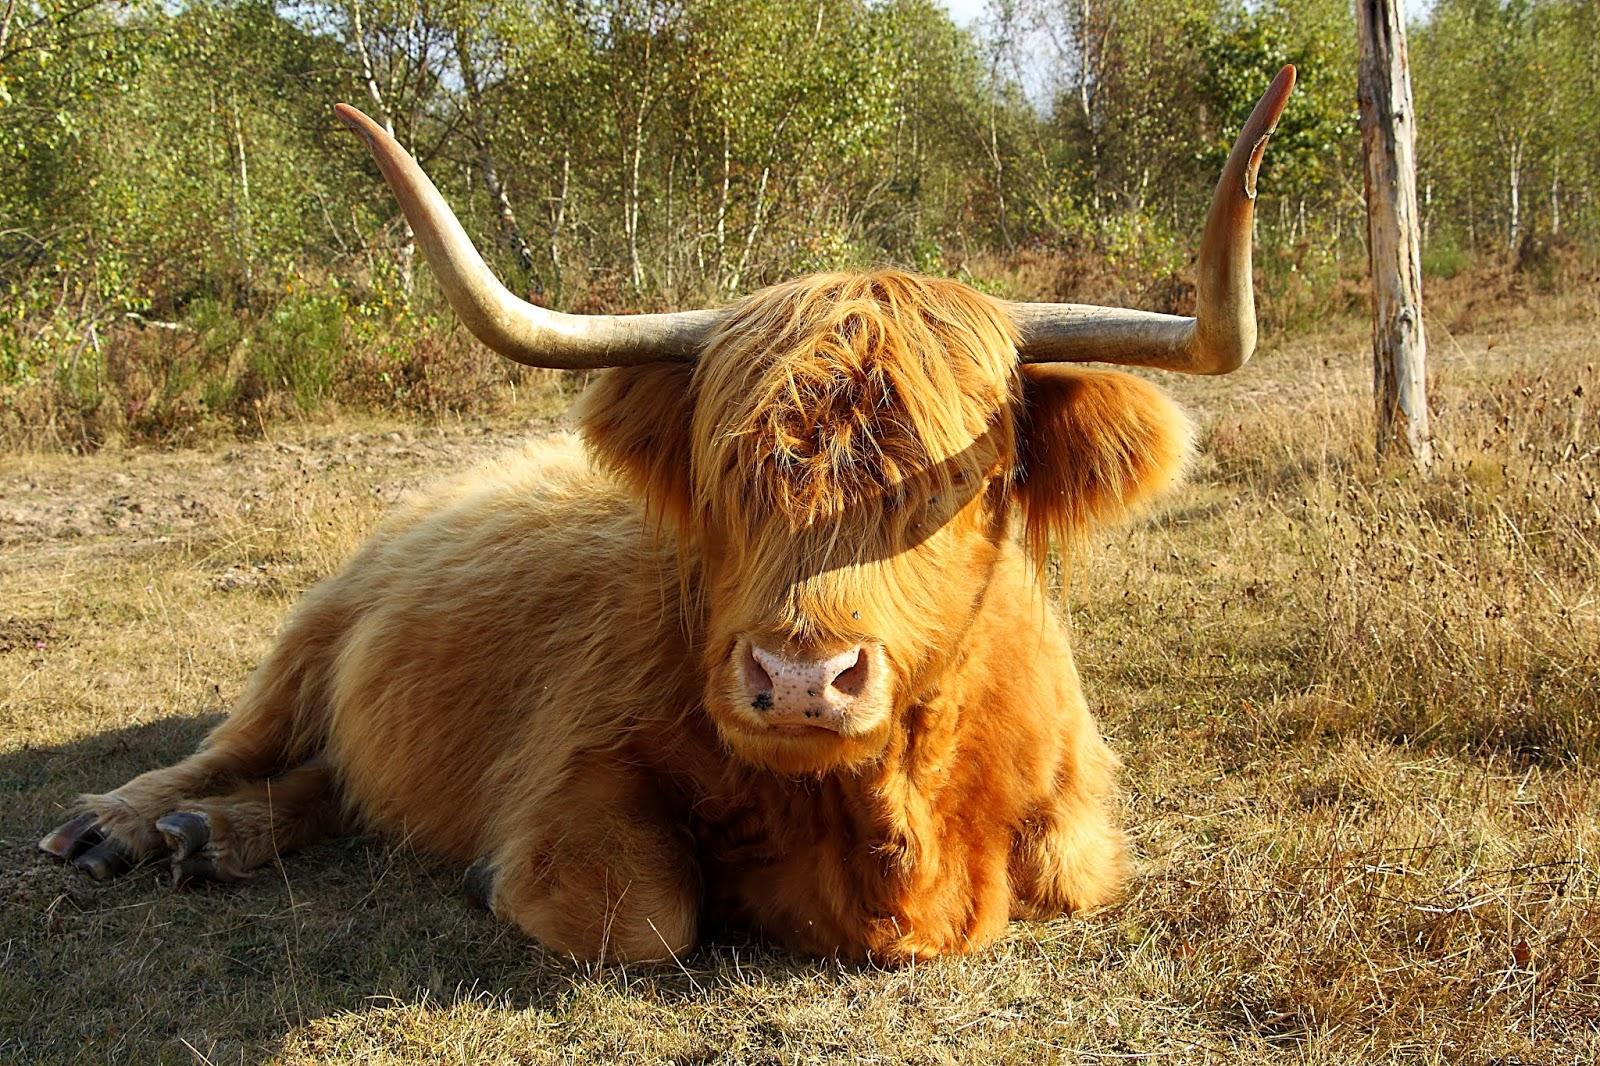 highland coos, coo, coos, highland cows